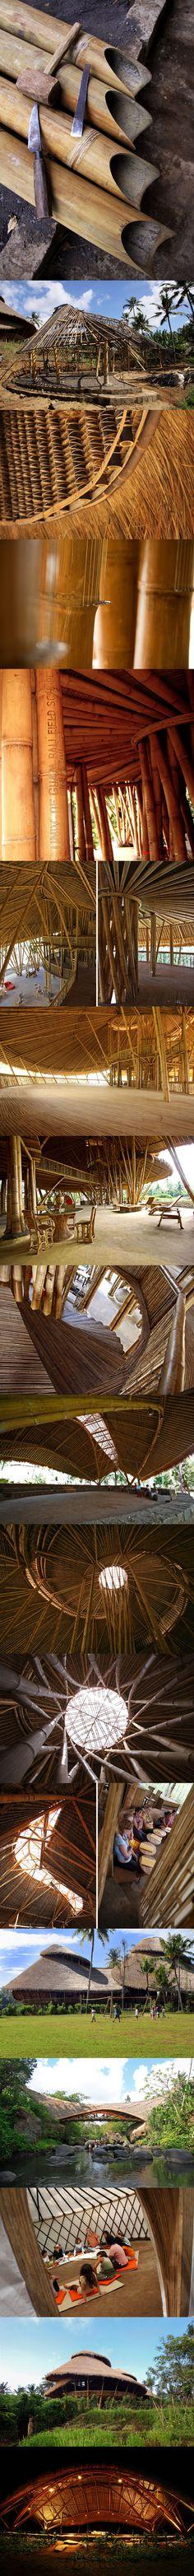 visit us on www.facebook.com/tribelab  PT bamboo pure: green school, bali